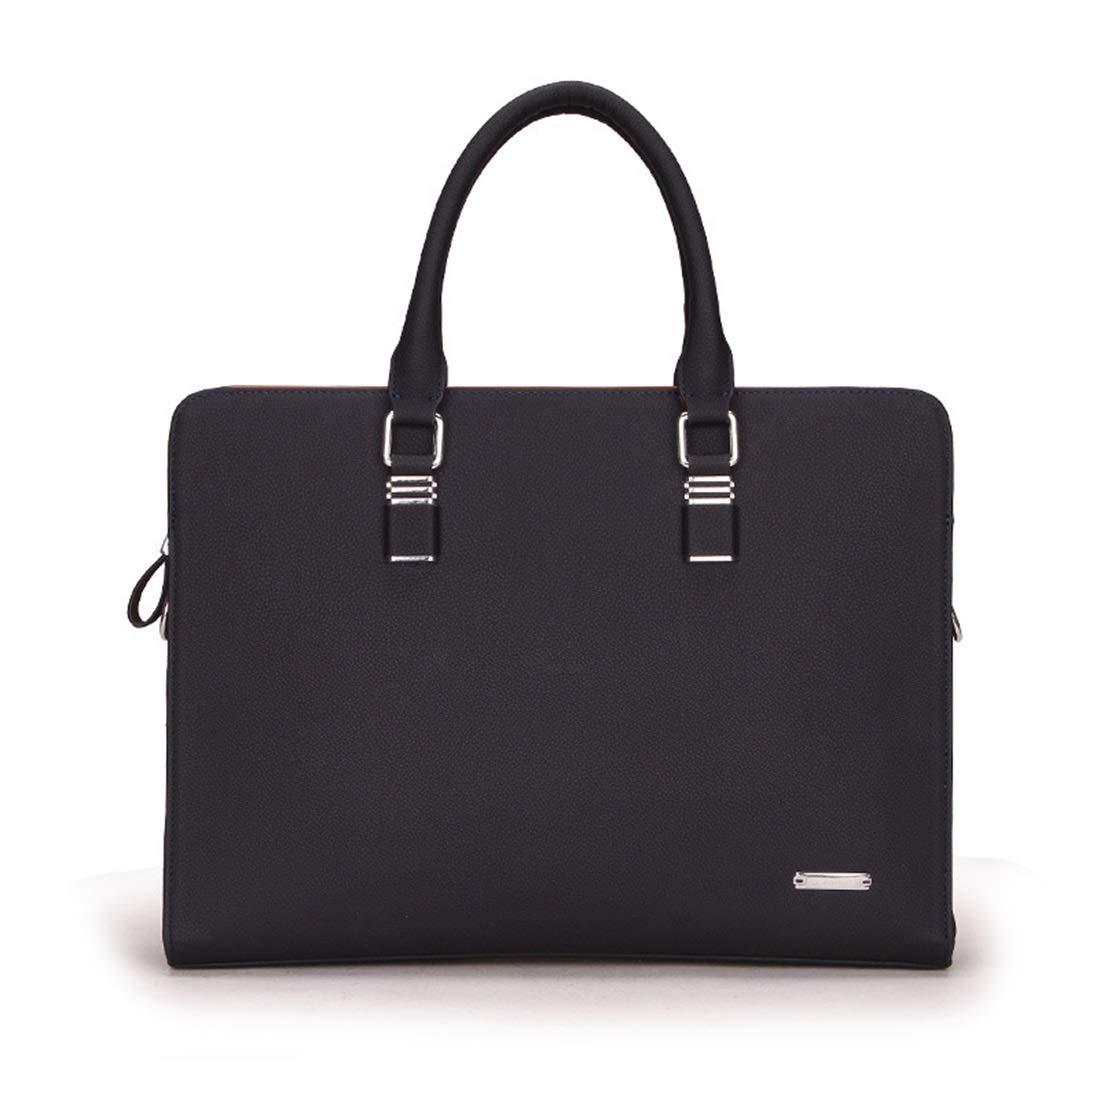 Carriemeow Black Leather Messenger Bag 13 Inch Laptop Briefcase Satchel Shoulder Handbag with Detachable Shoulder Strap (Color : Blue)